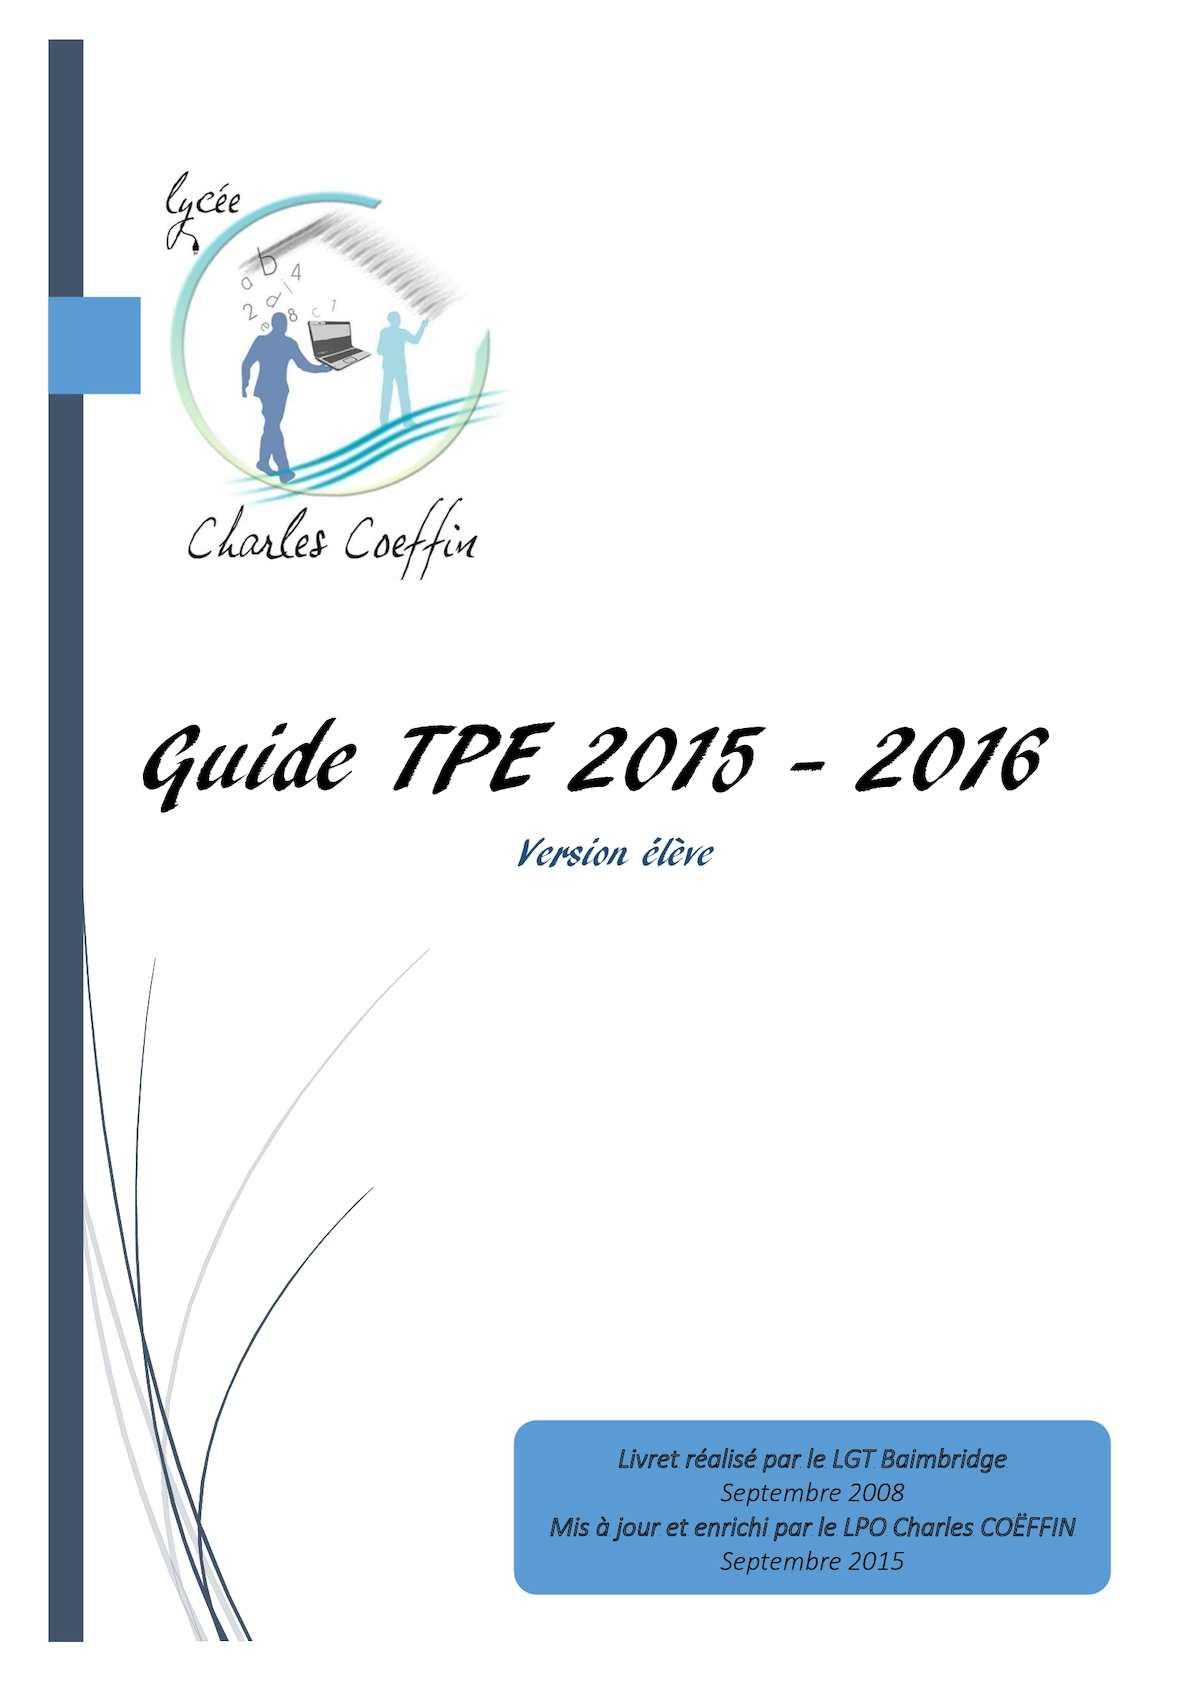 Berühmt Calaméo - Guide TPE ELève 2015 2016 RQ22